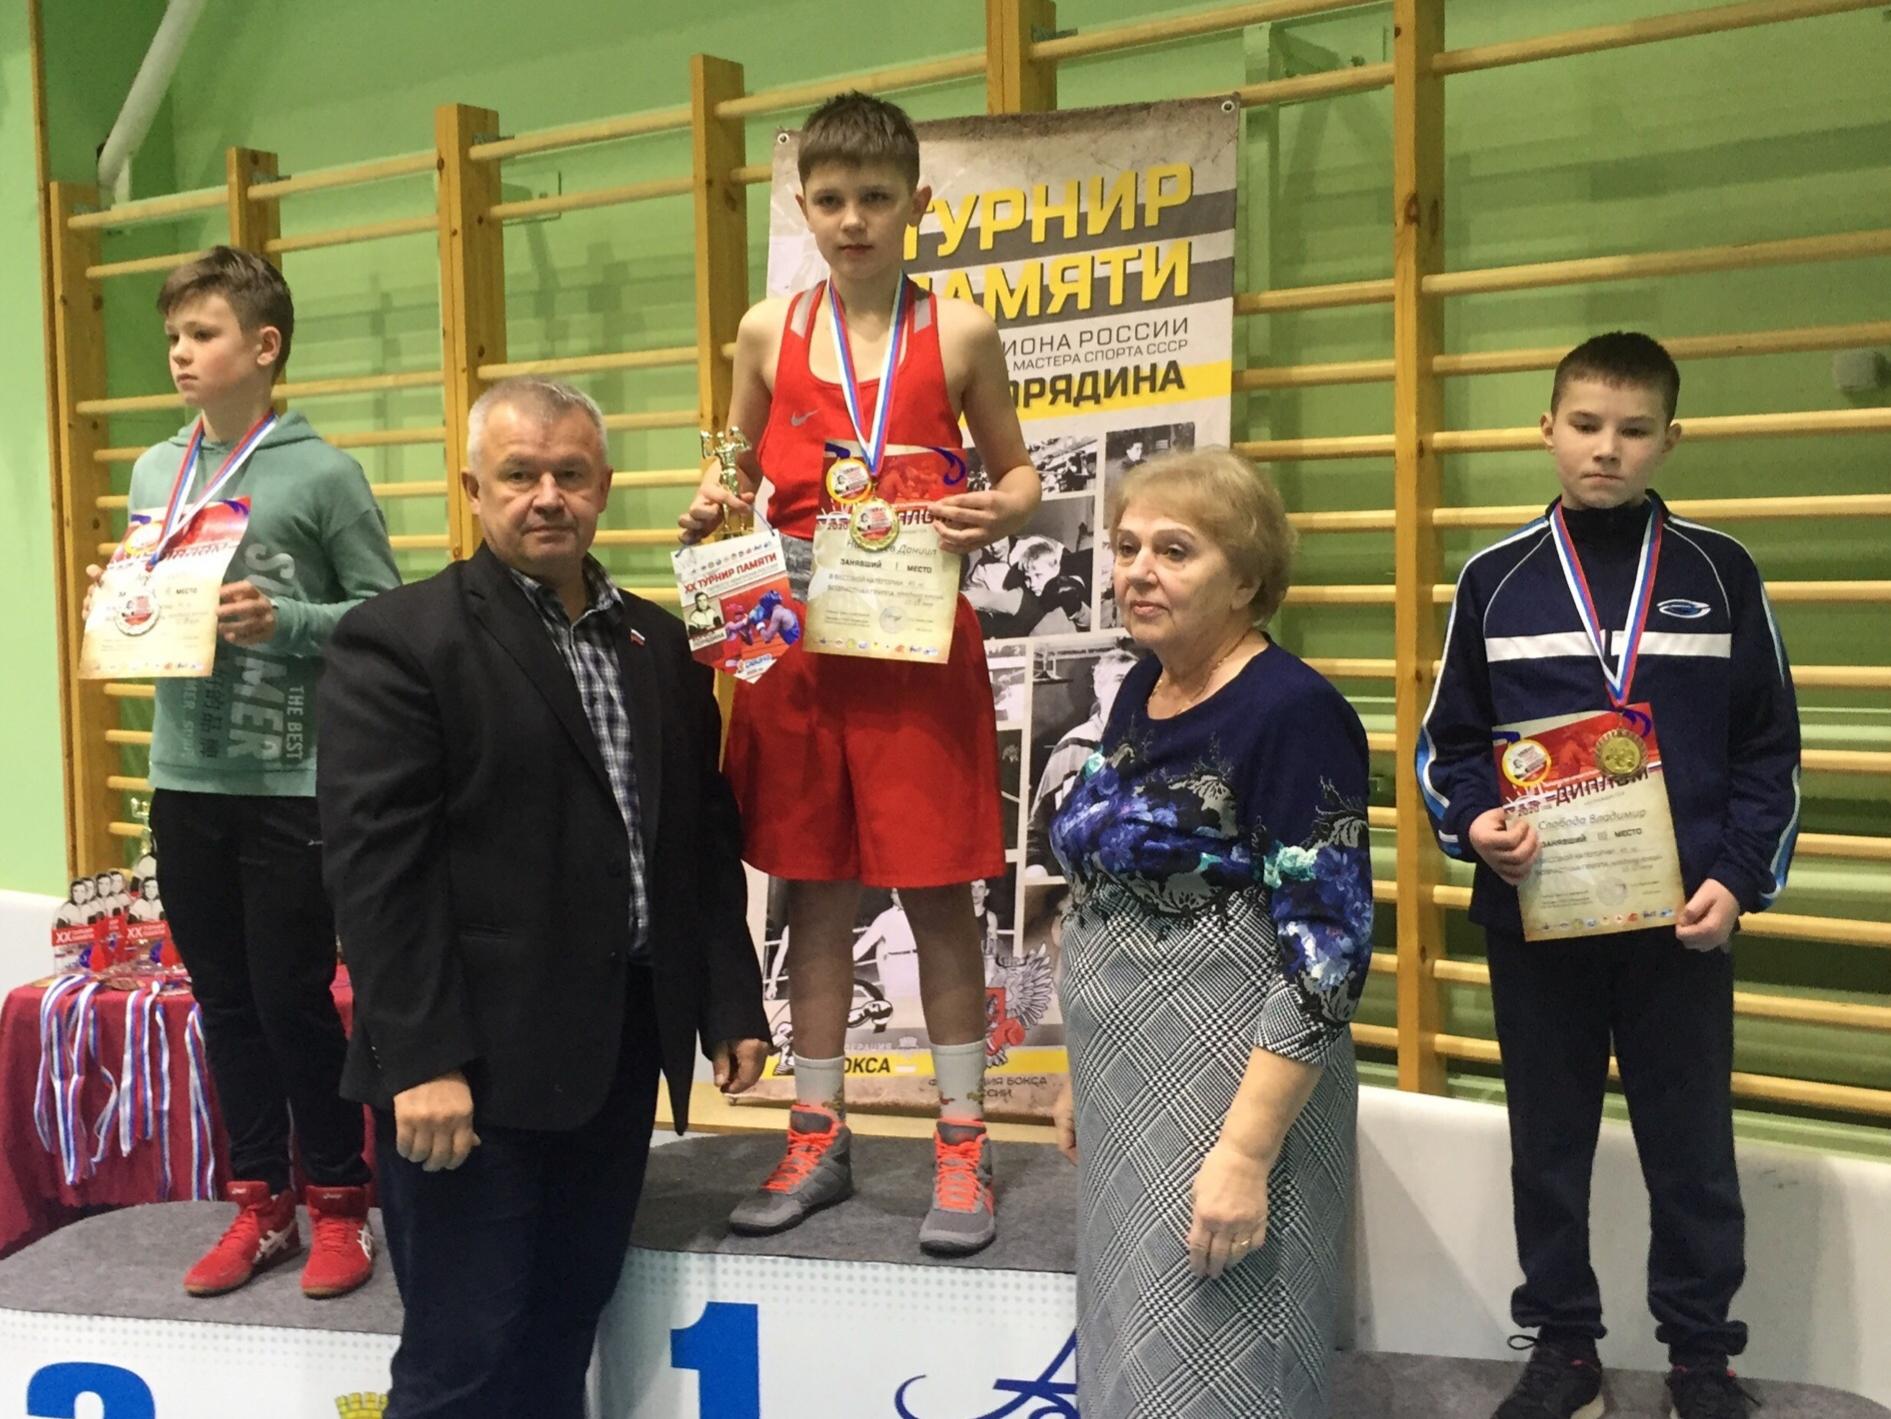 Фотоотчет с 20-го турнира памяти Бориса Порядина (г.Новодвинск 2020)